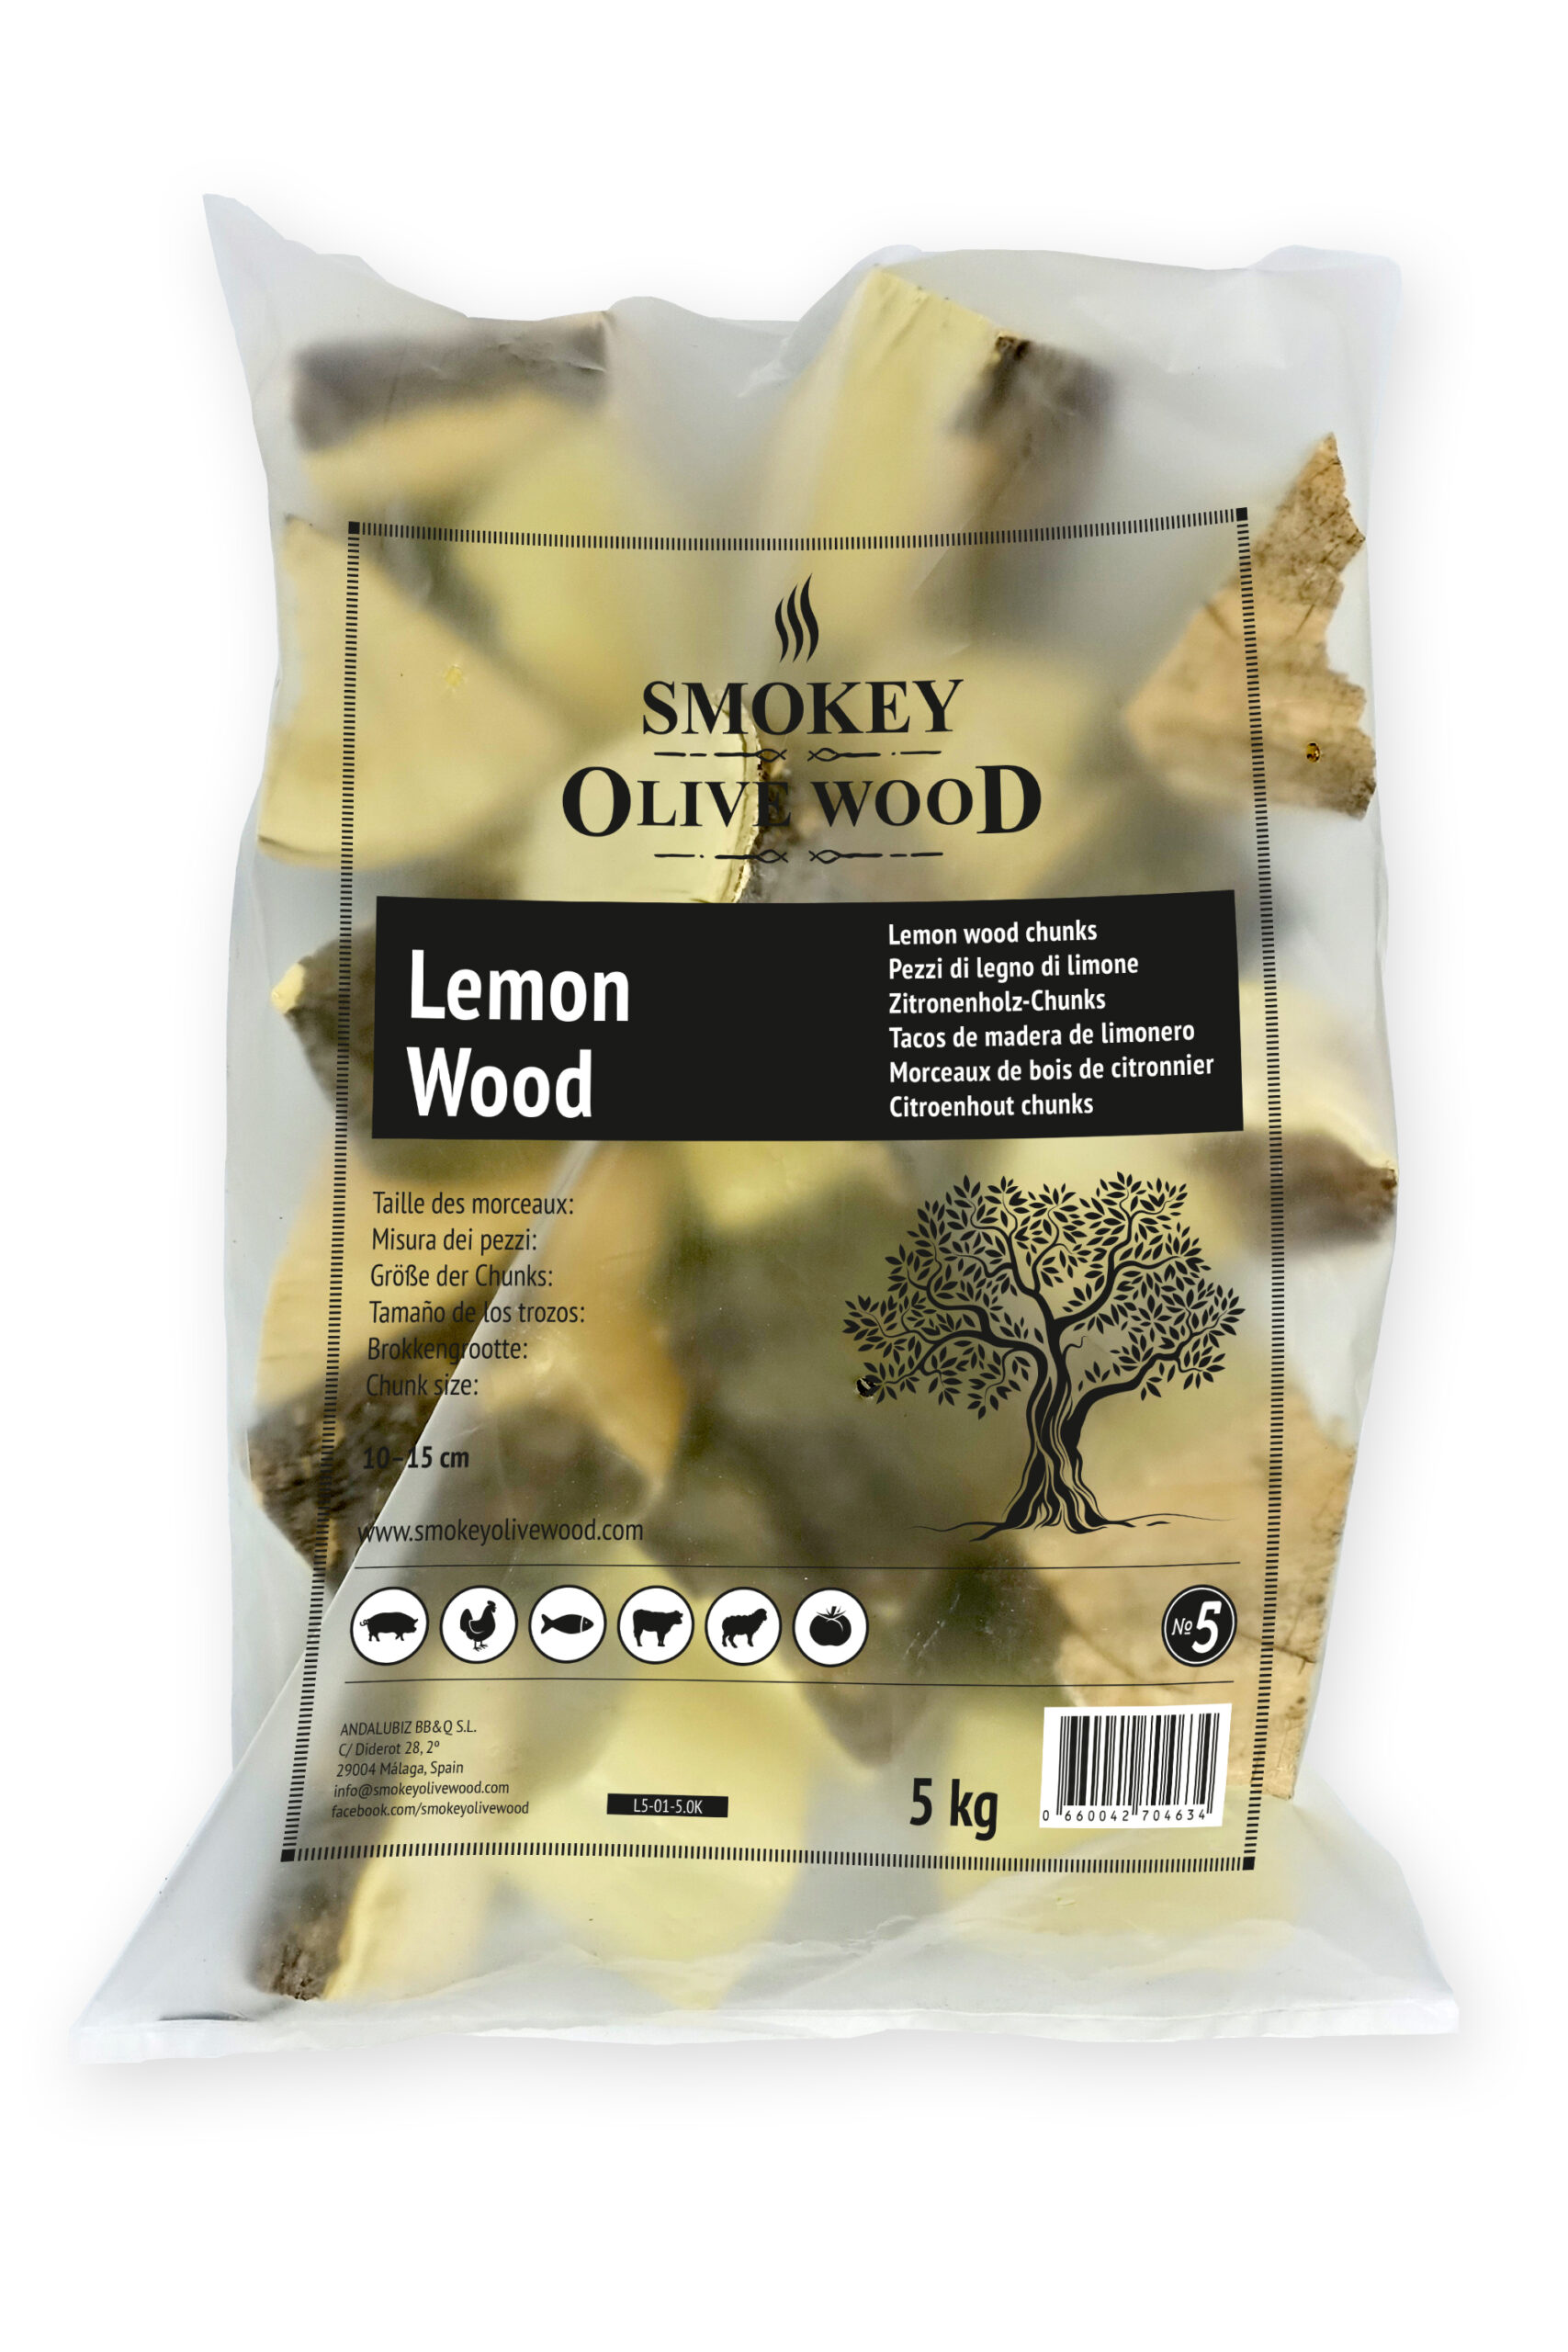 SOW lemon wood chunks